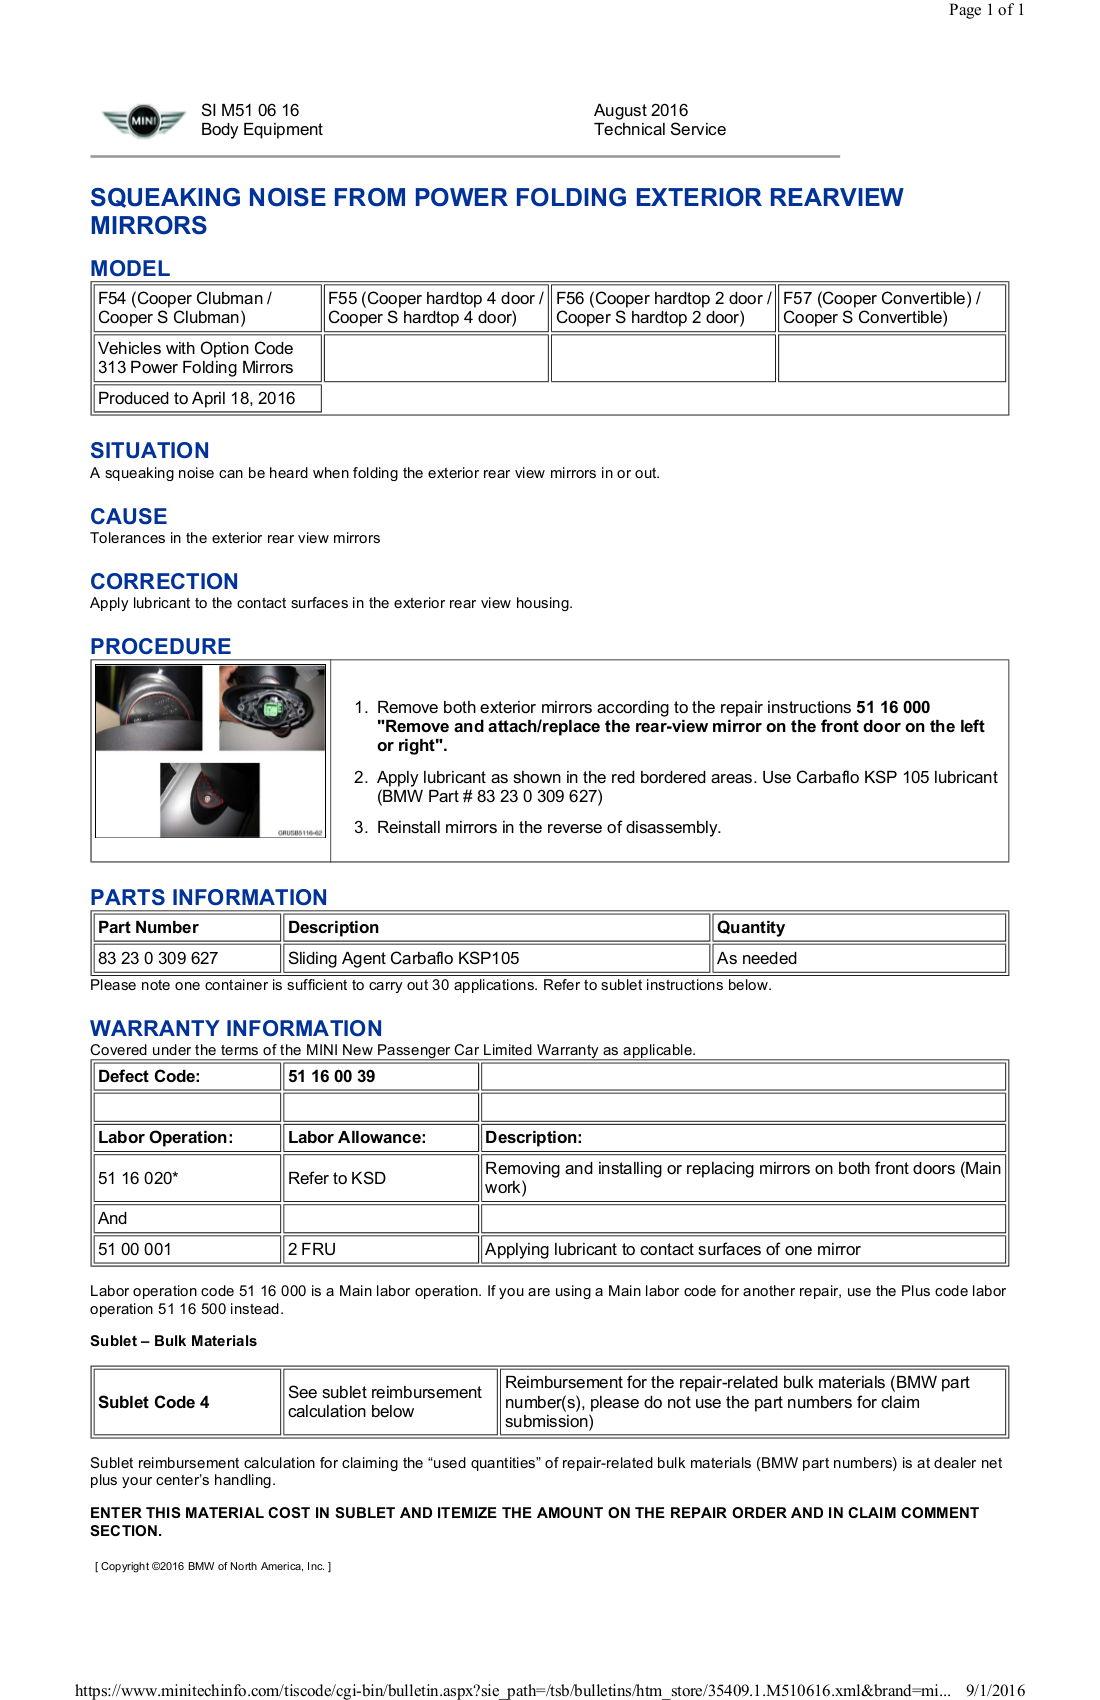 F56 Service Bulletin Master List - North American Motoring